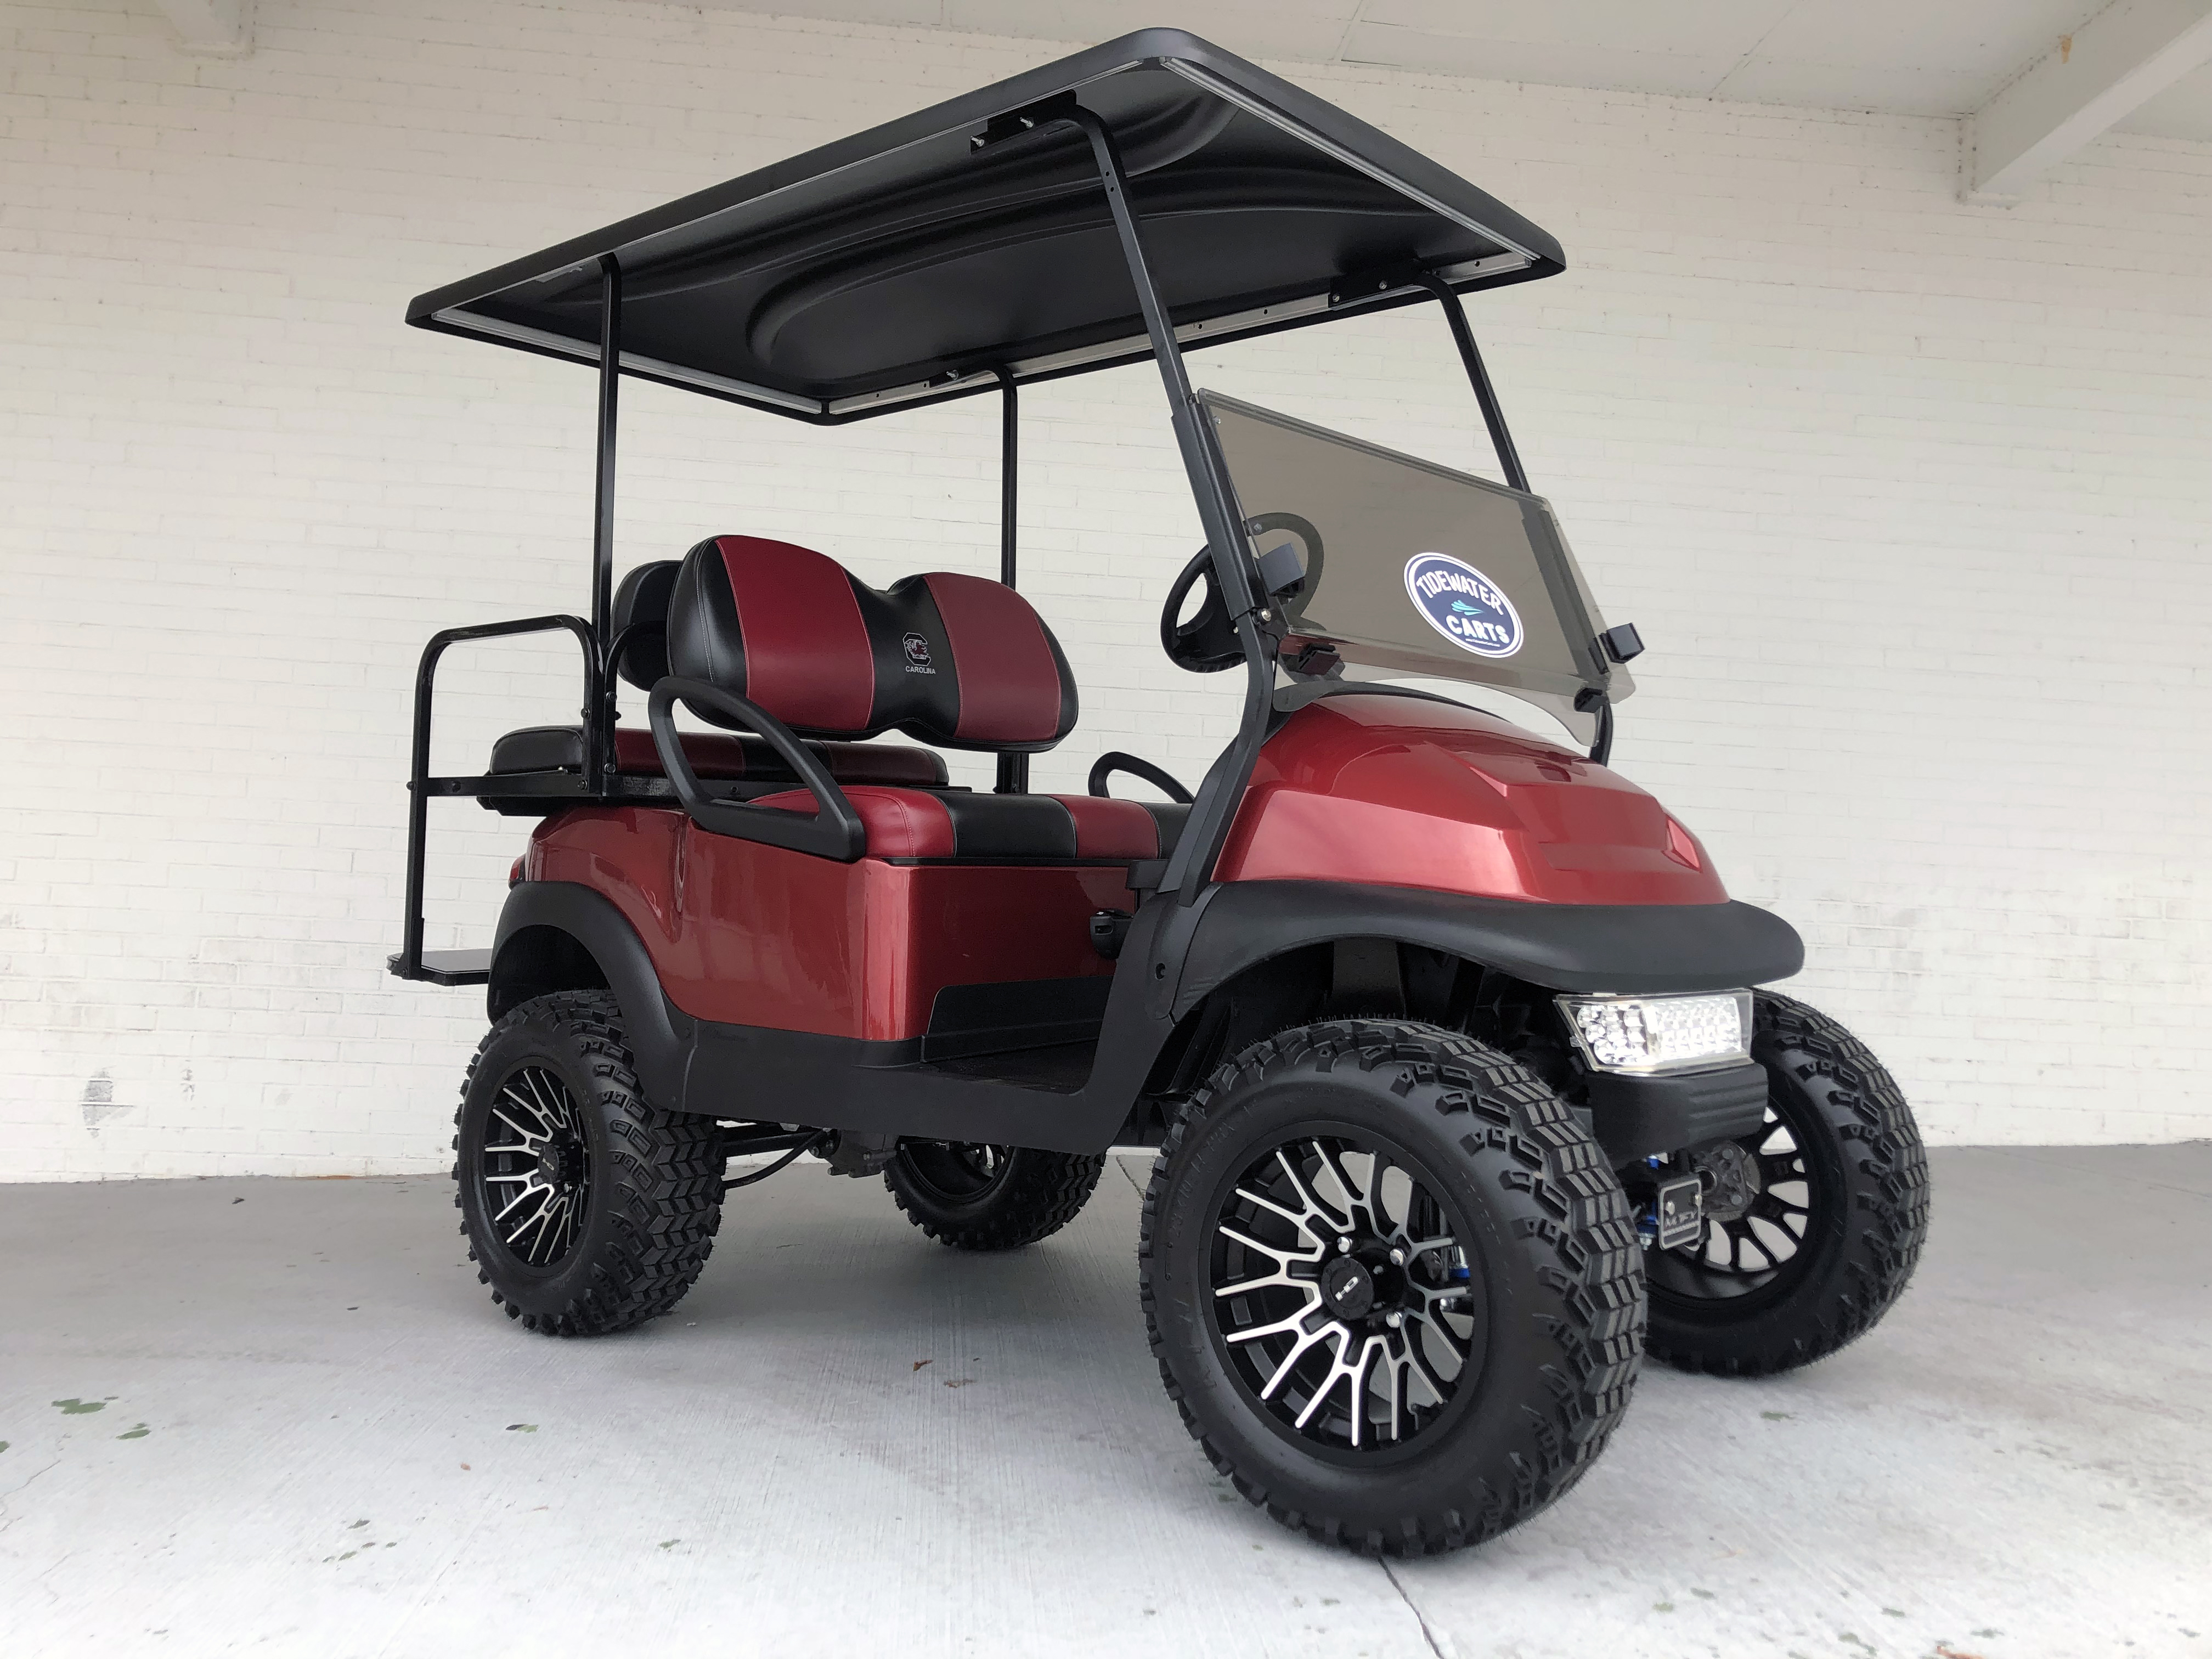 Sc Gamecocks Lifted Club Car Golf Cart Golf Carts Lifted